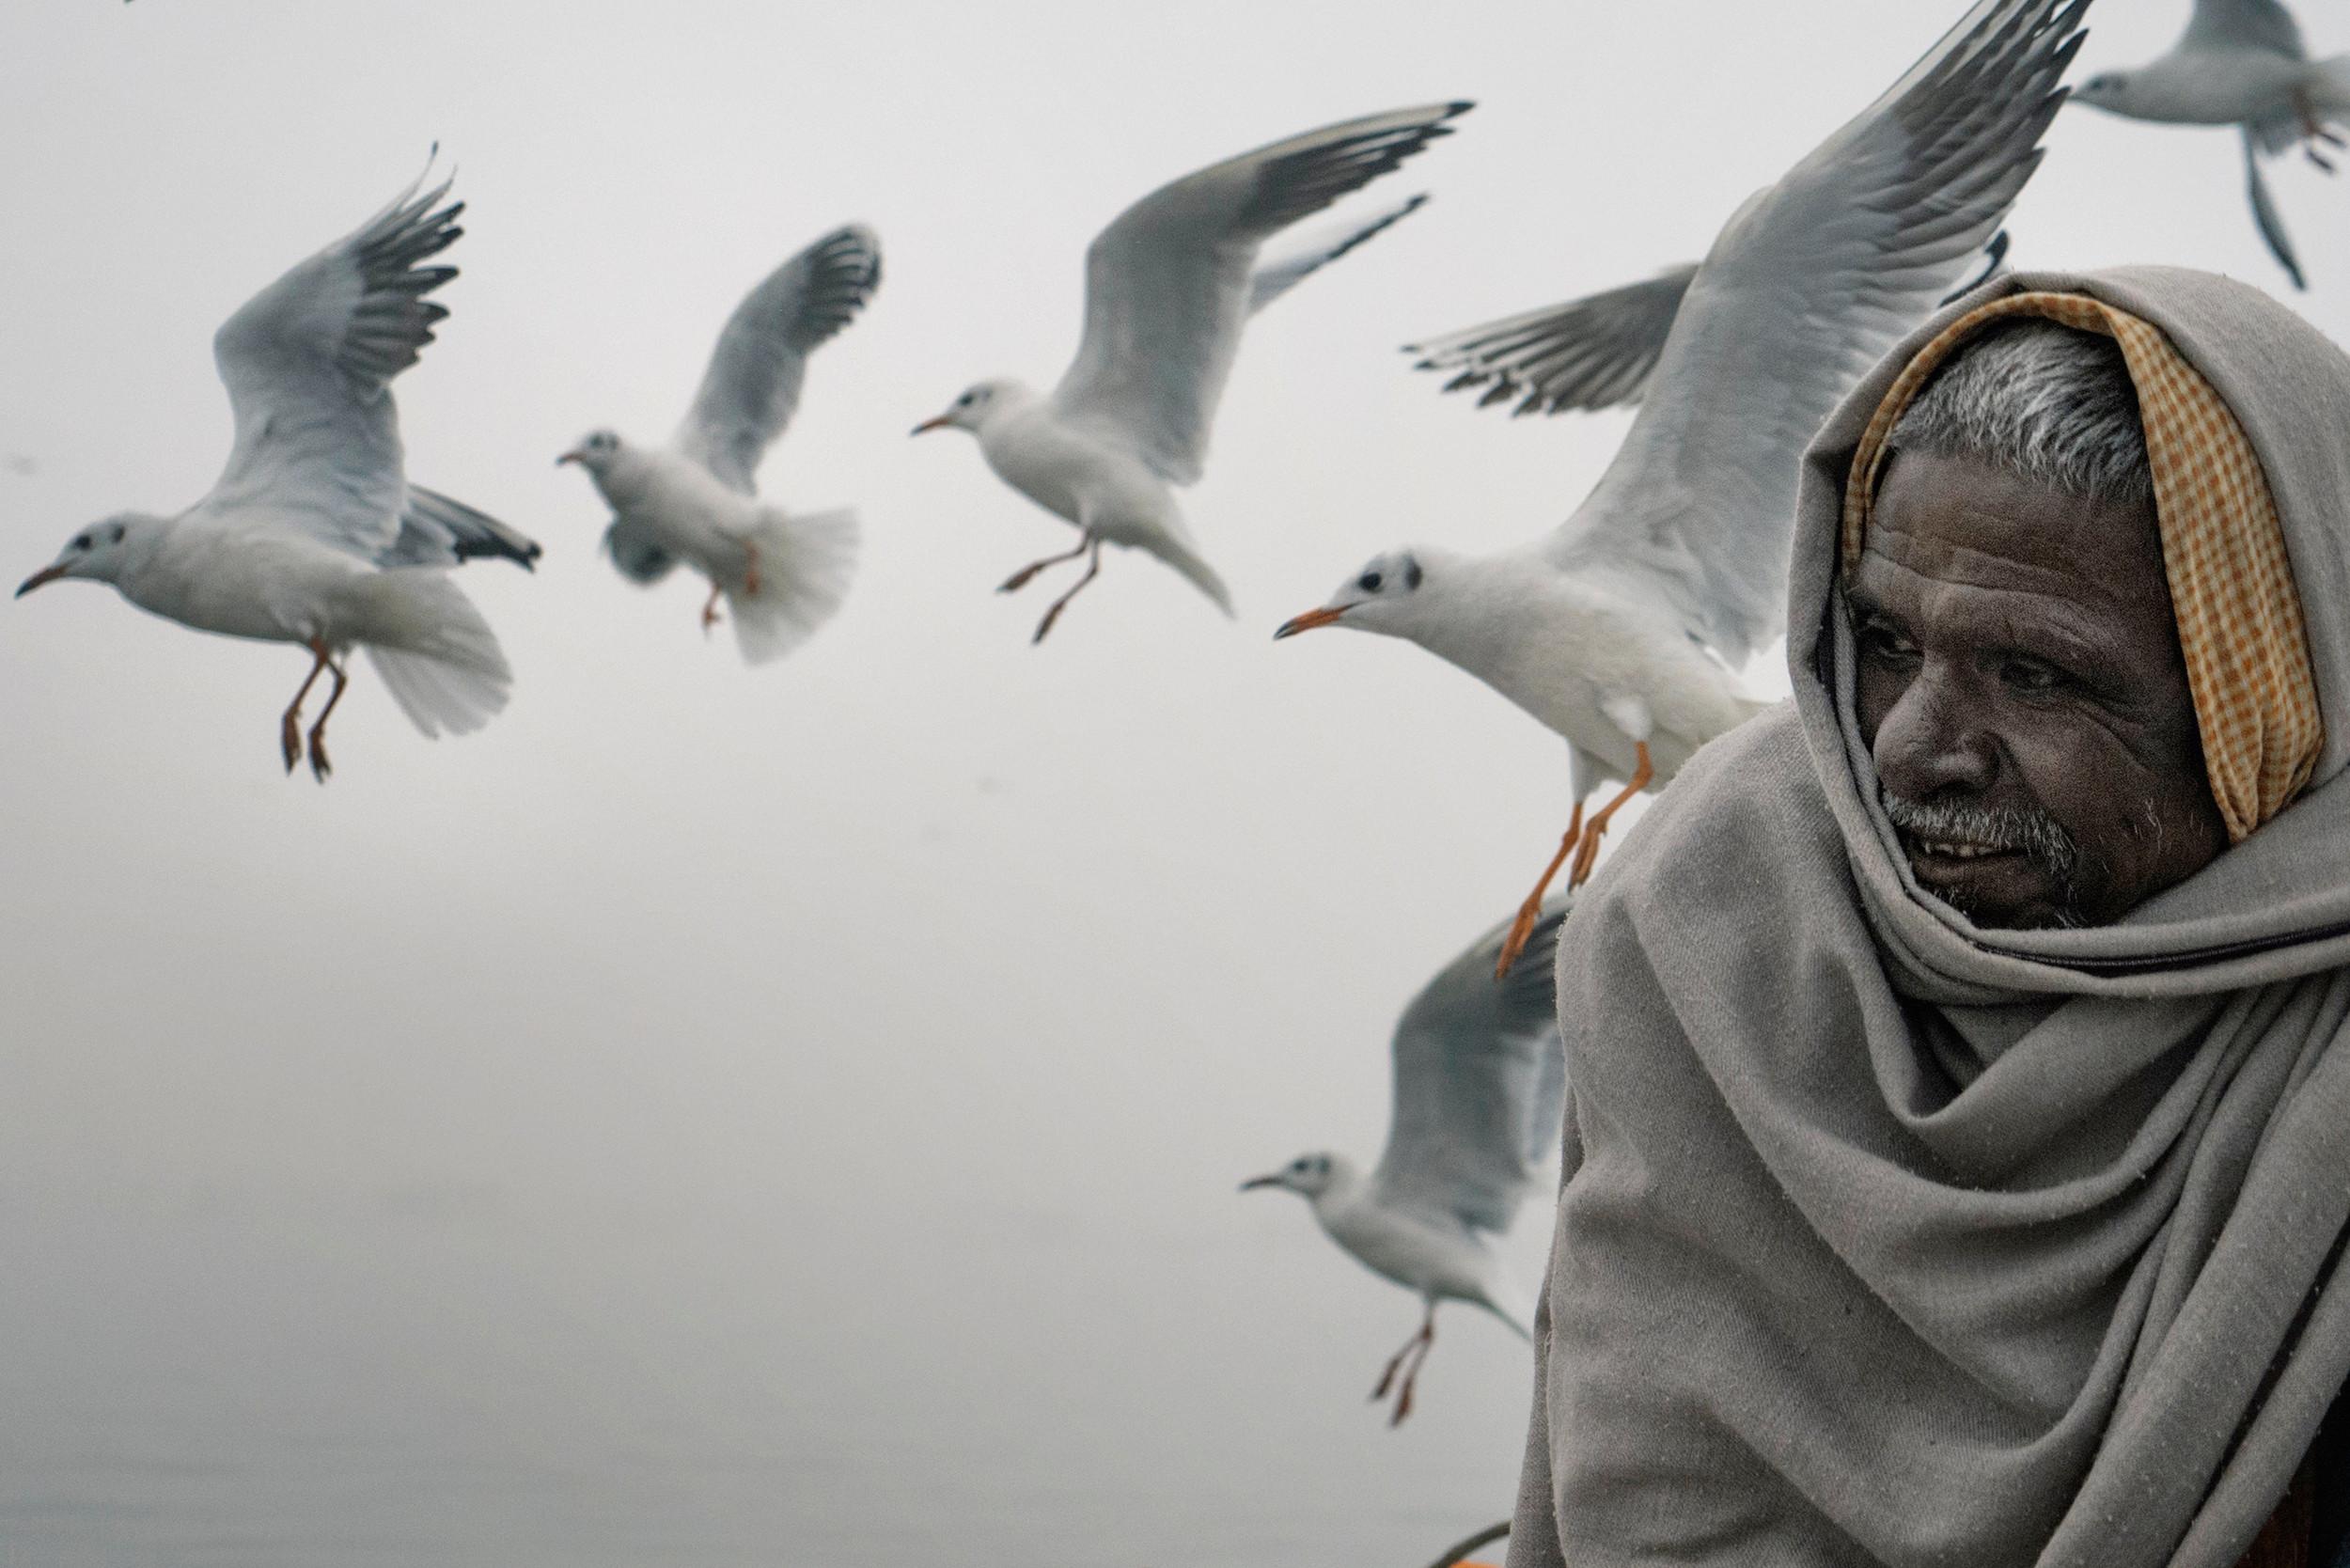 Varanasi boatman and birds